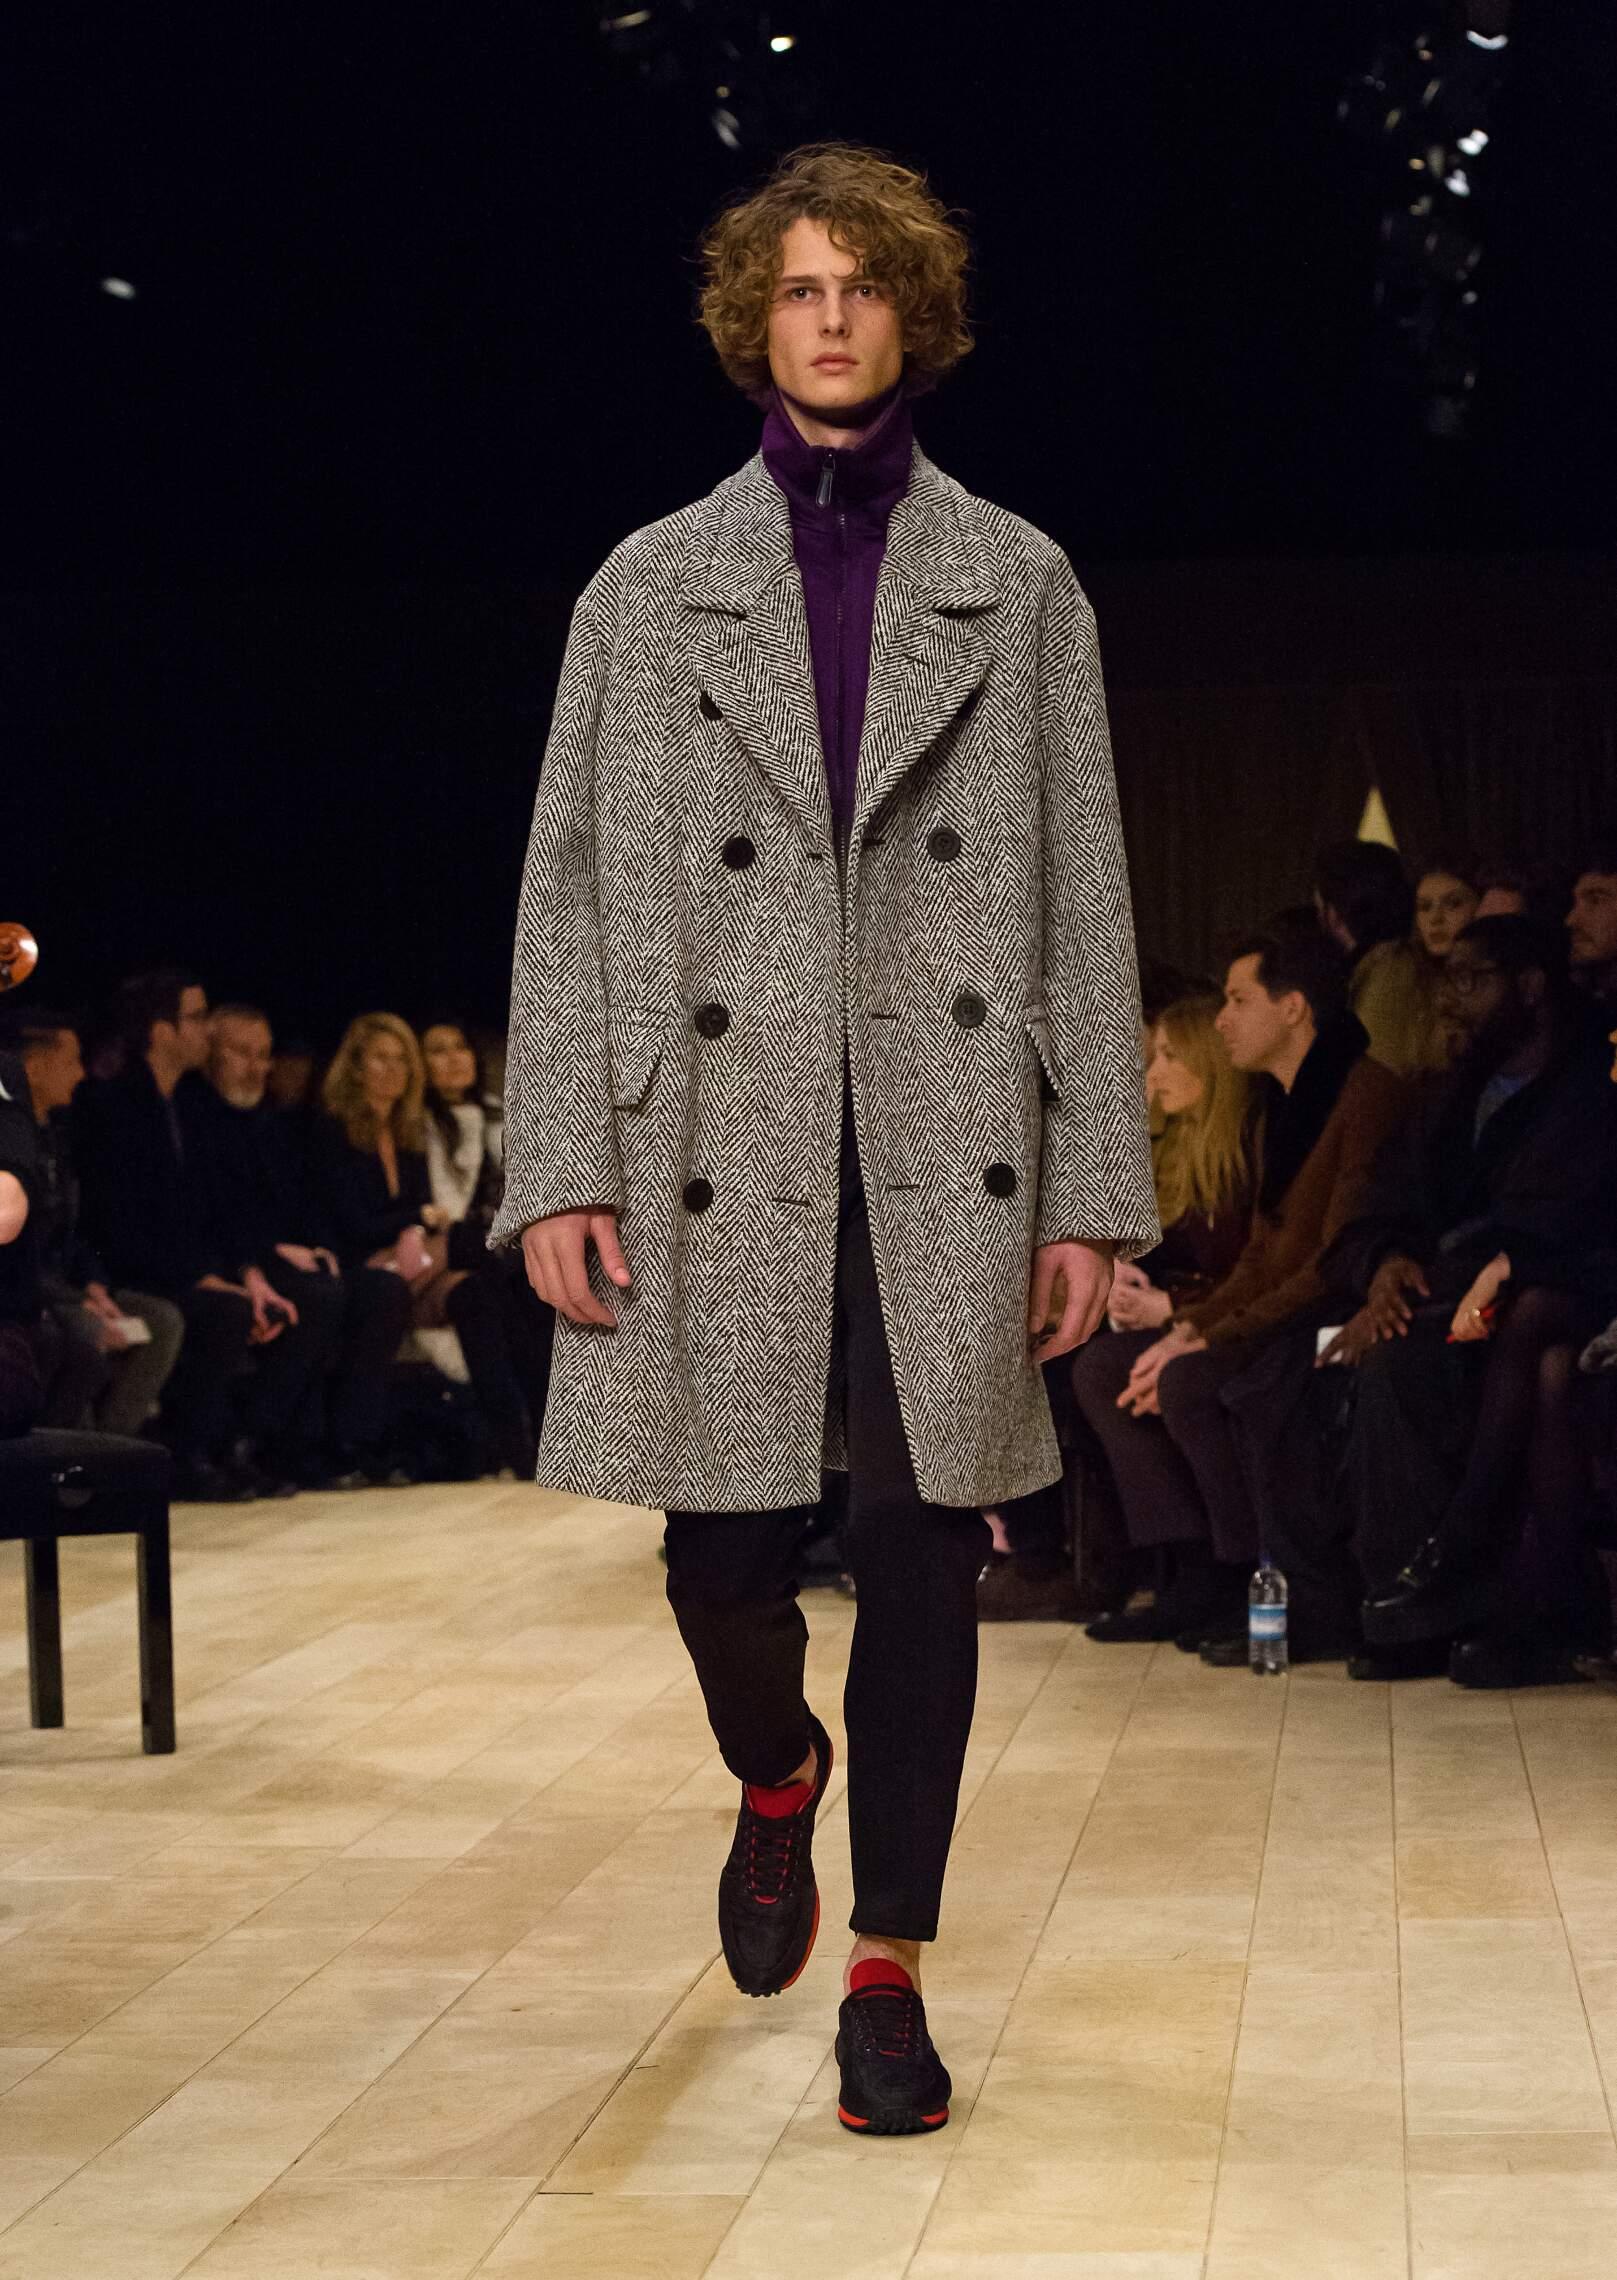 Catwalk Burberry Man Fashion Show Winter 2016